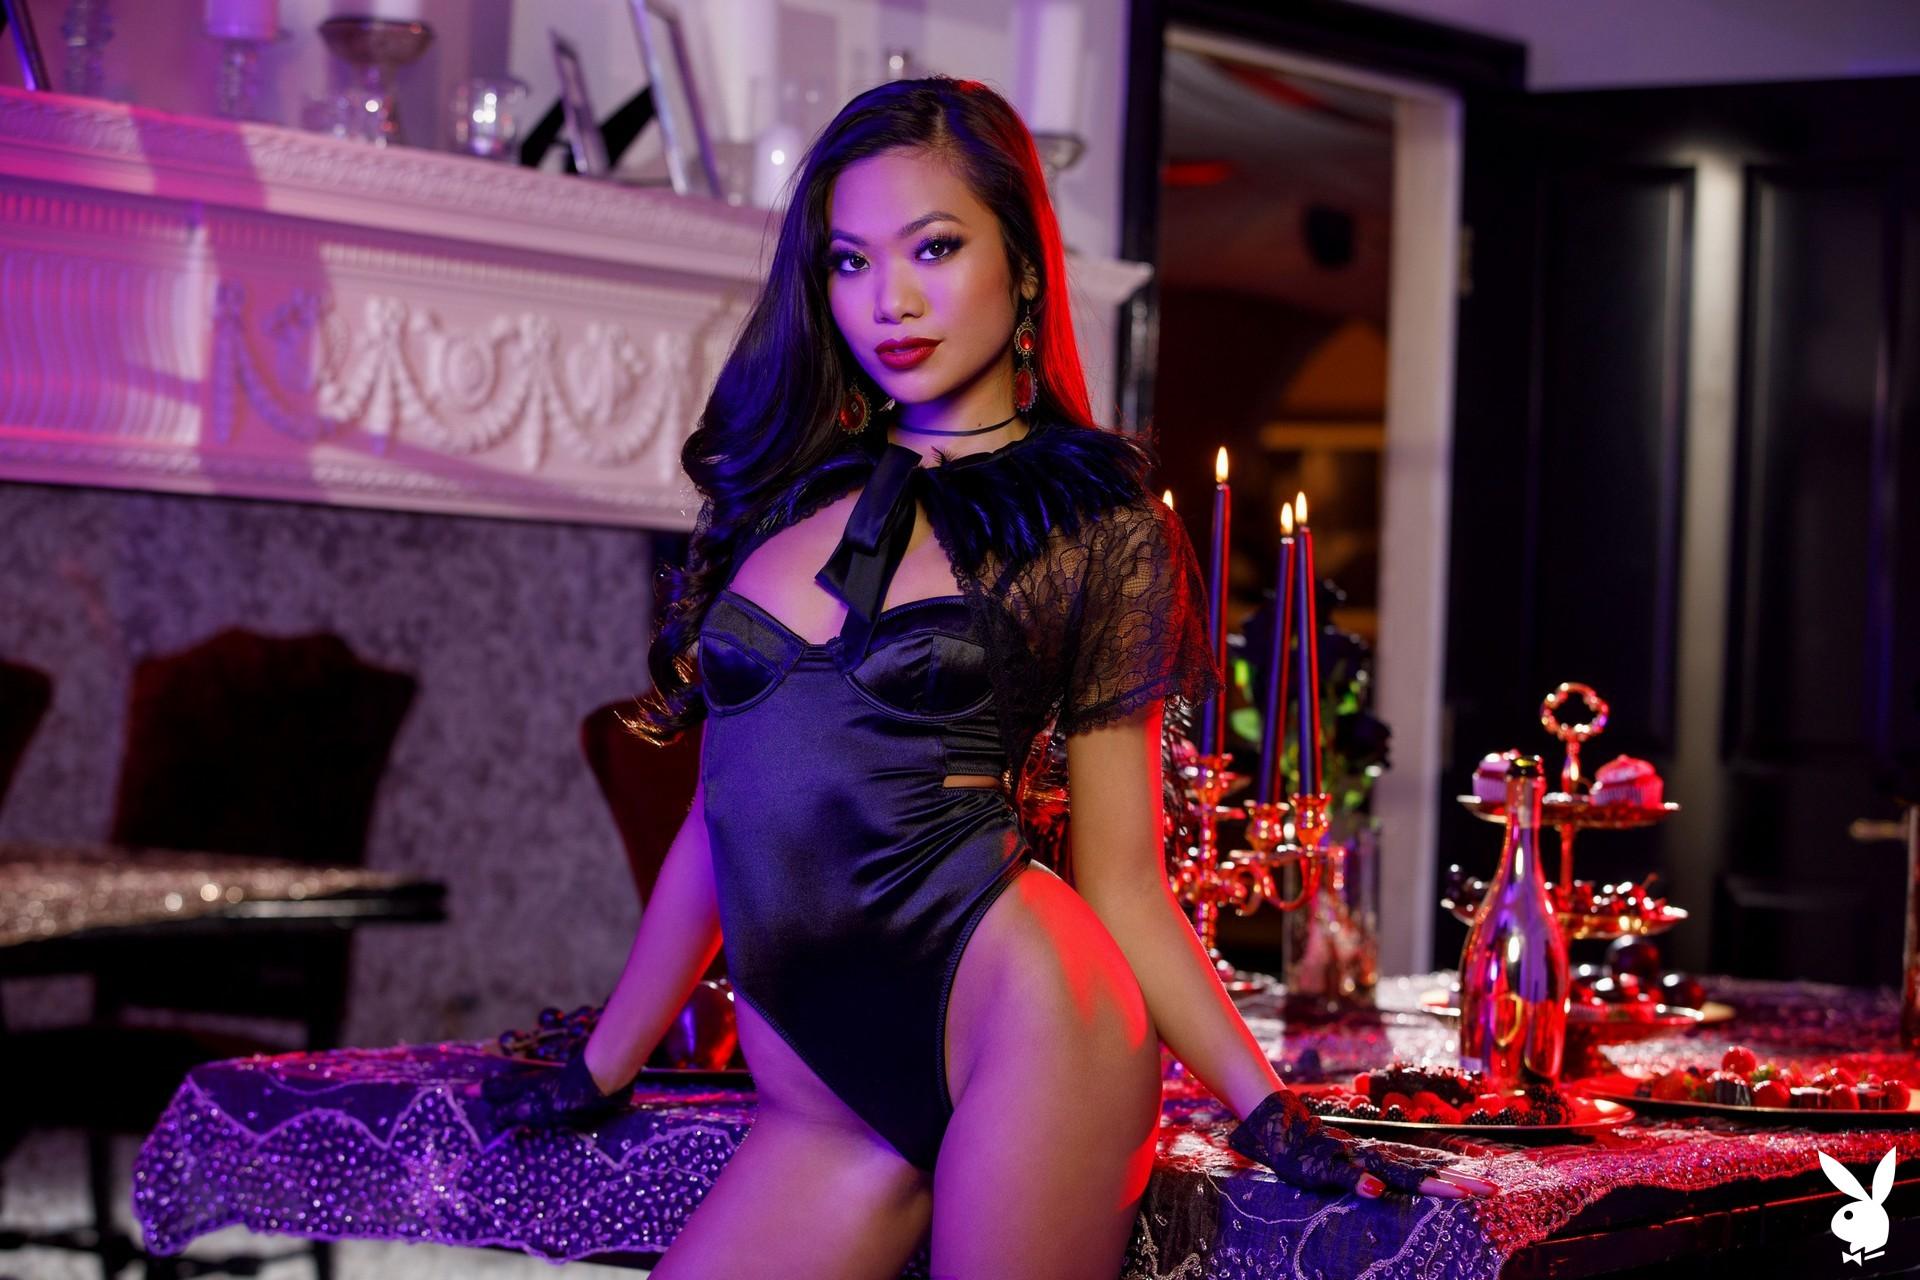 Vina Sky In Midnight Indulgence Playboy Plus (2)